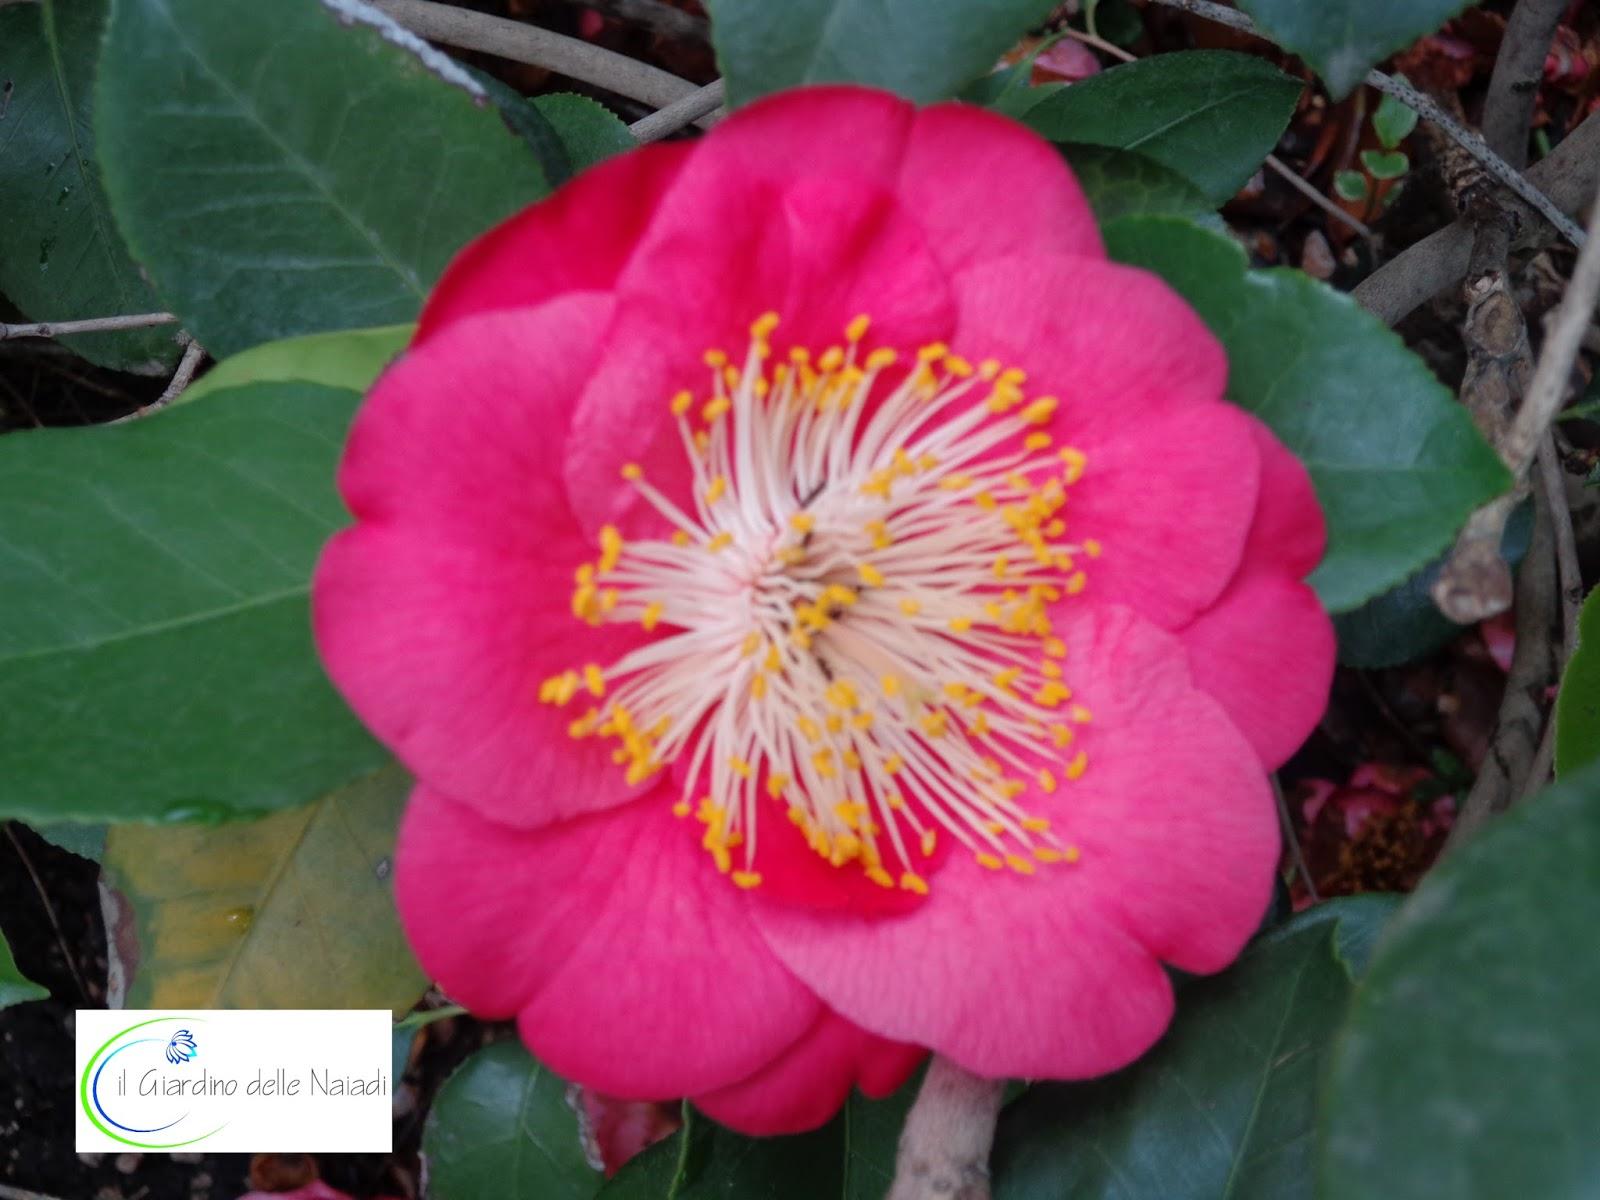 il giardino delle naiadi: gennaio 2016 - Piccolo Giardino Sinonimo